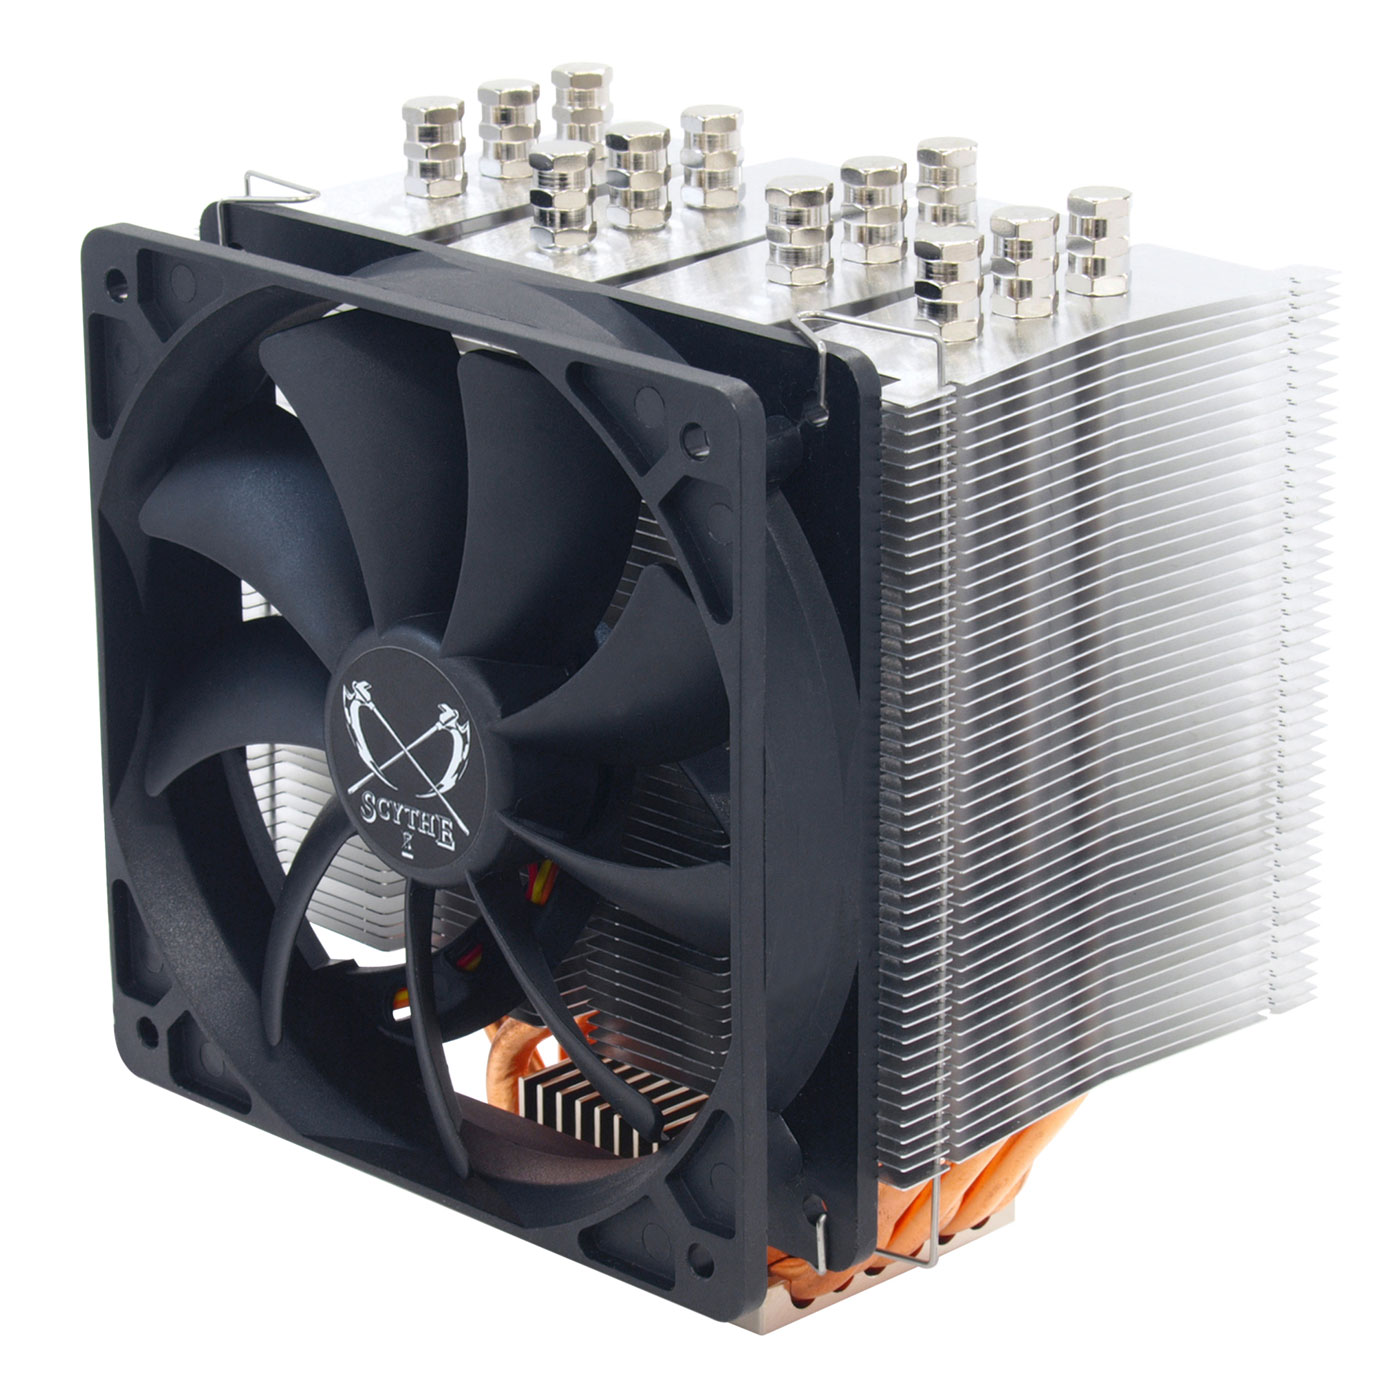 Ventilateur processeur Scythe Mugen 3 Rev. B Ventilateur pour processeur (pour socket Intel 775 / 1150/1151/1155 / 1156 / 1366 / 2011 et AMD AM2 / AM2+ / AM3 / AM3+ / FM1)